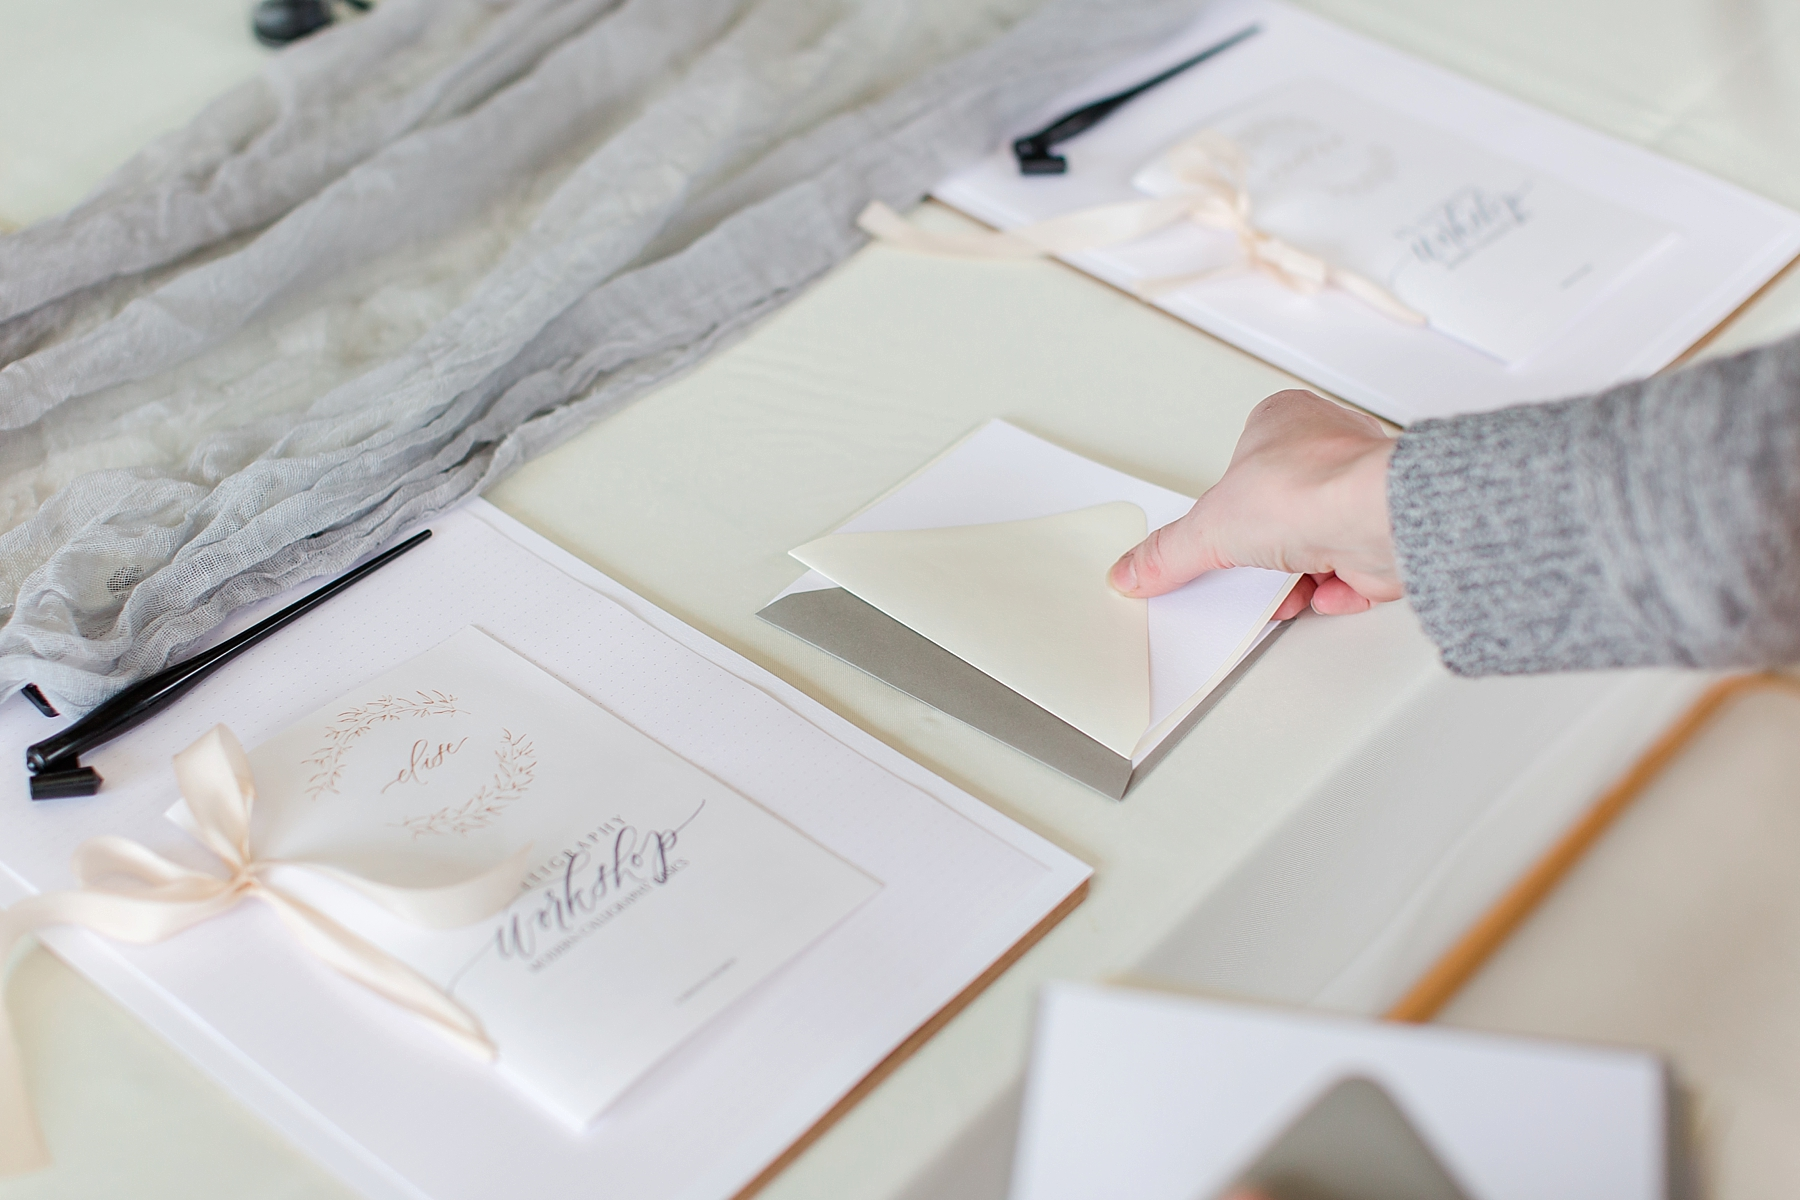 seattle-calligraphy-workshop_0017.jpg